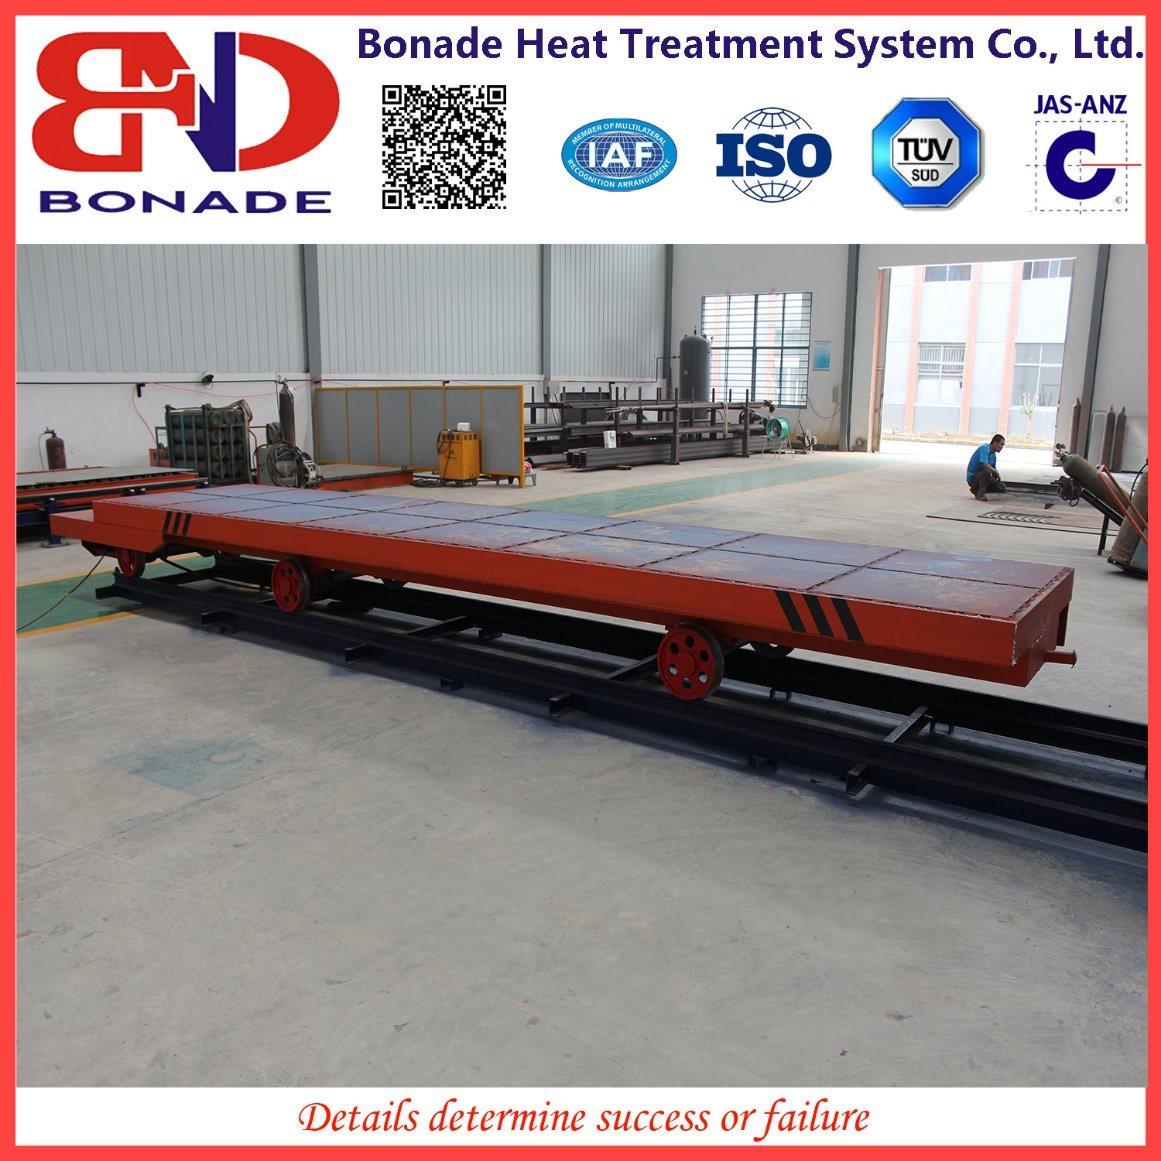 900kw Air Circulation Bogie Hearth Furnaces for Heat Treatment